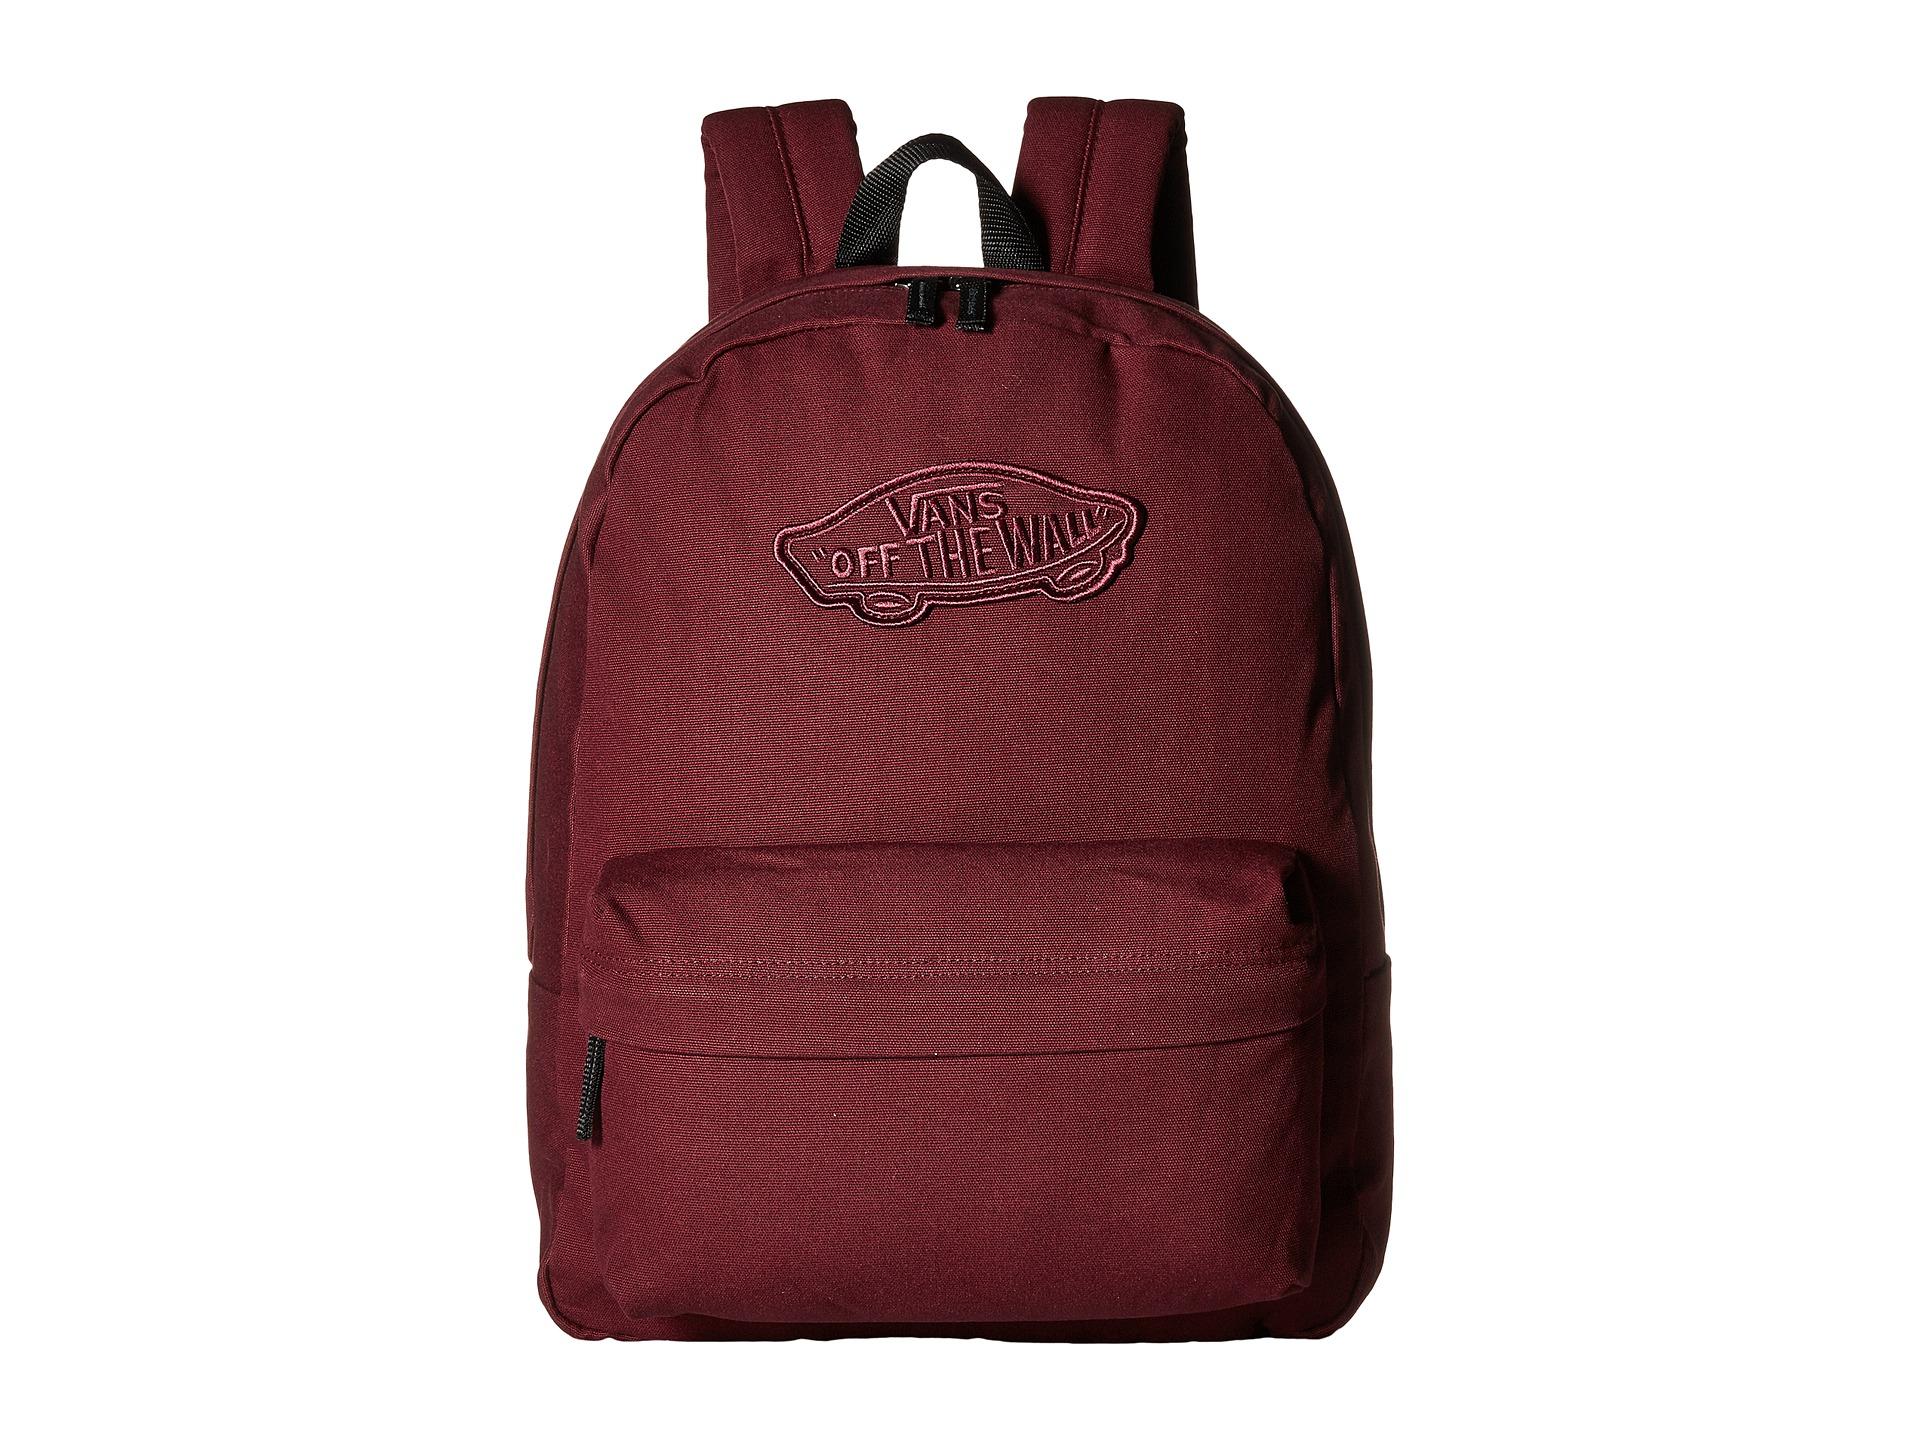 Lyst - Vans Realm Backpack in Red for Men 6ba46d709fa